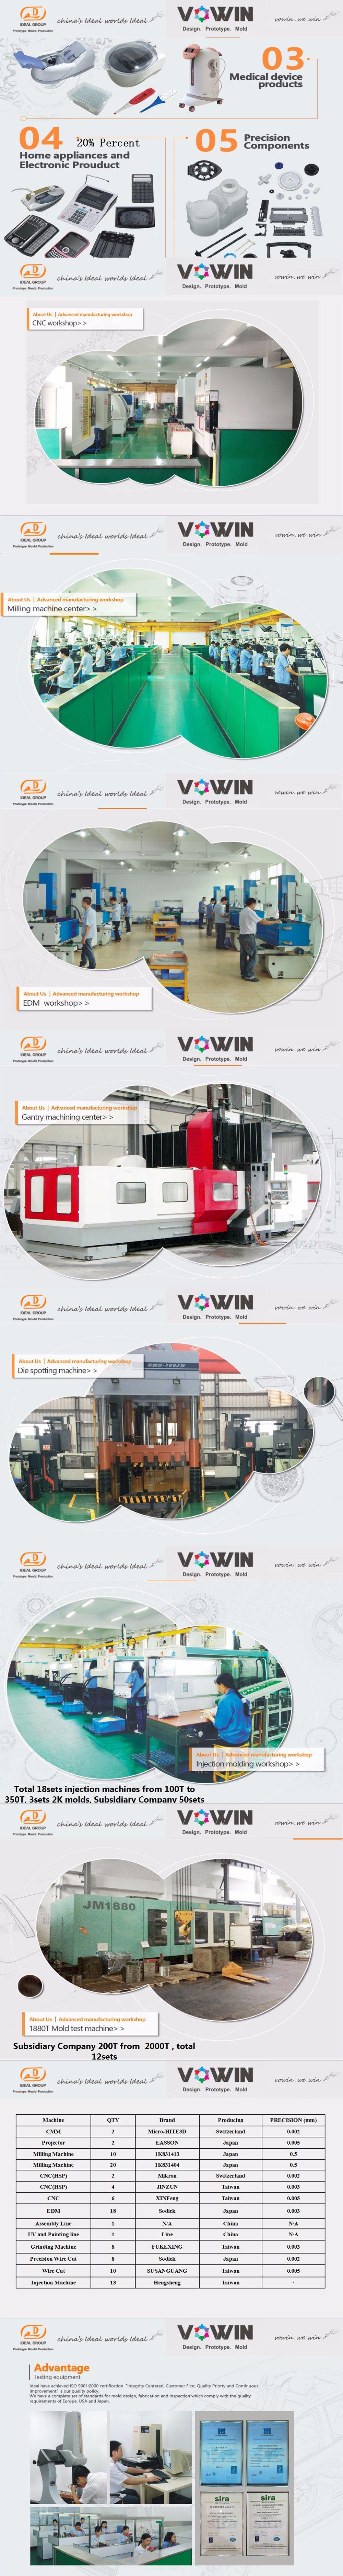 Automotive Parts Silicon Mold/Silicon Moulding